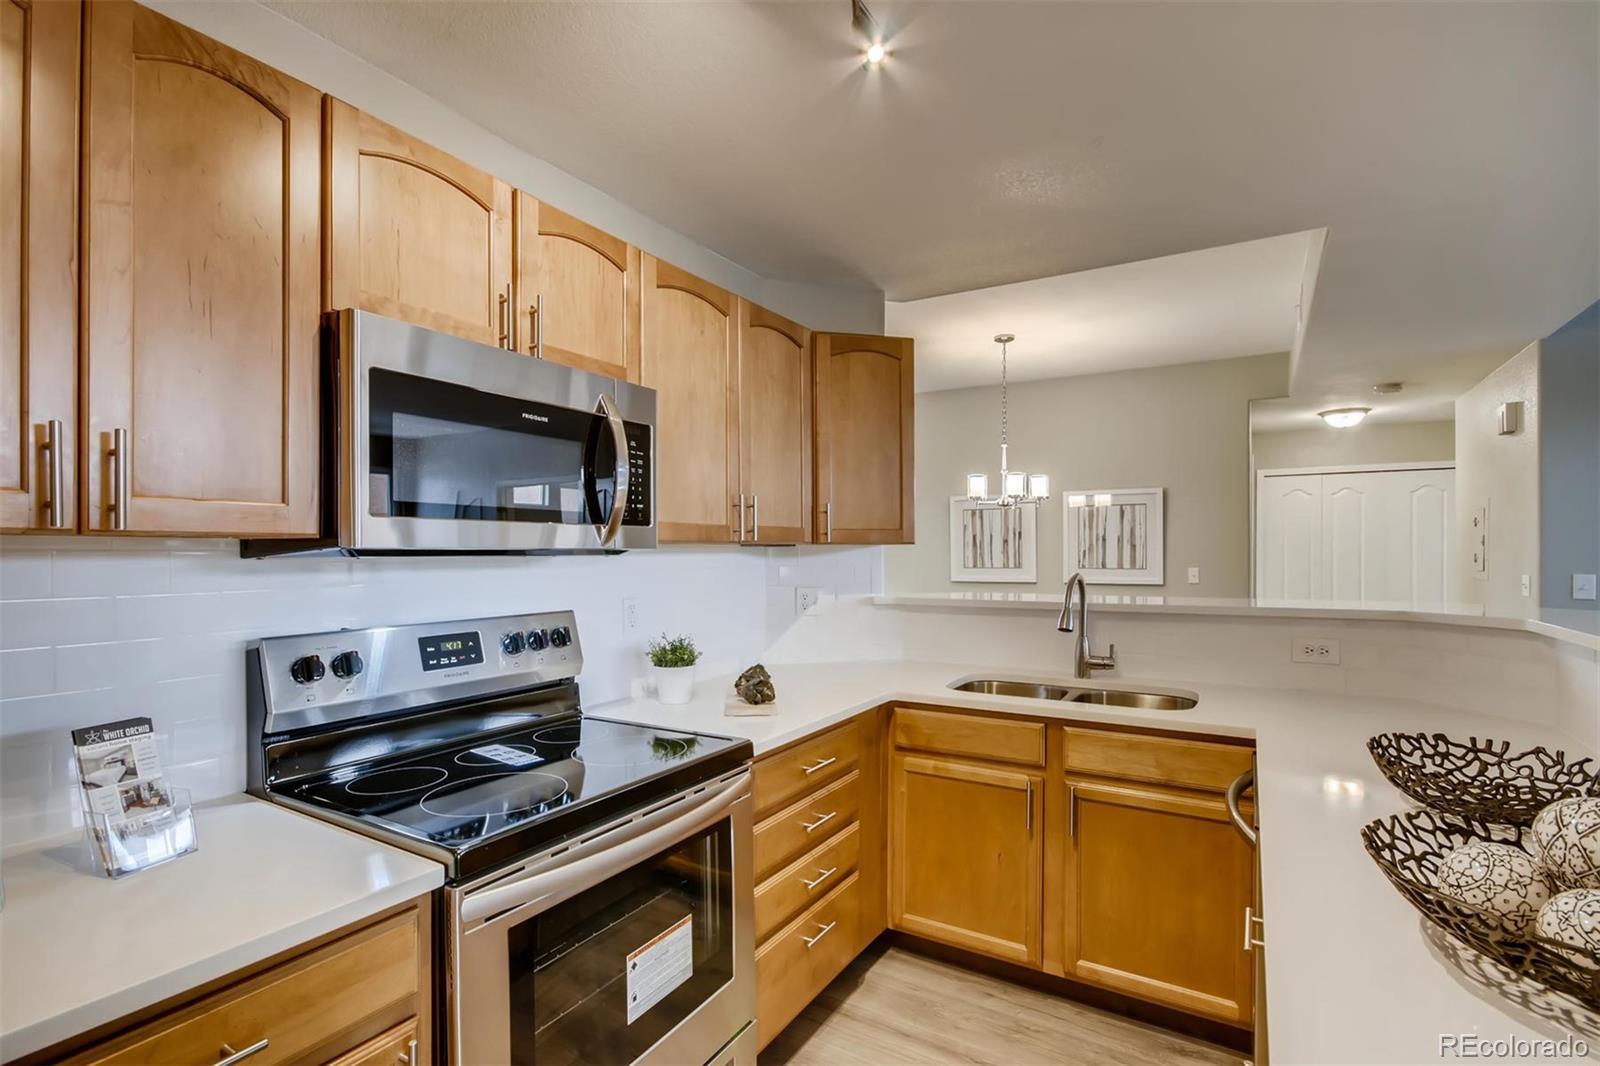 MLS# 8795072 - 8 - 990 S Locust Street #C, Denver, CO 80224